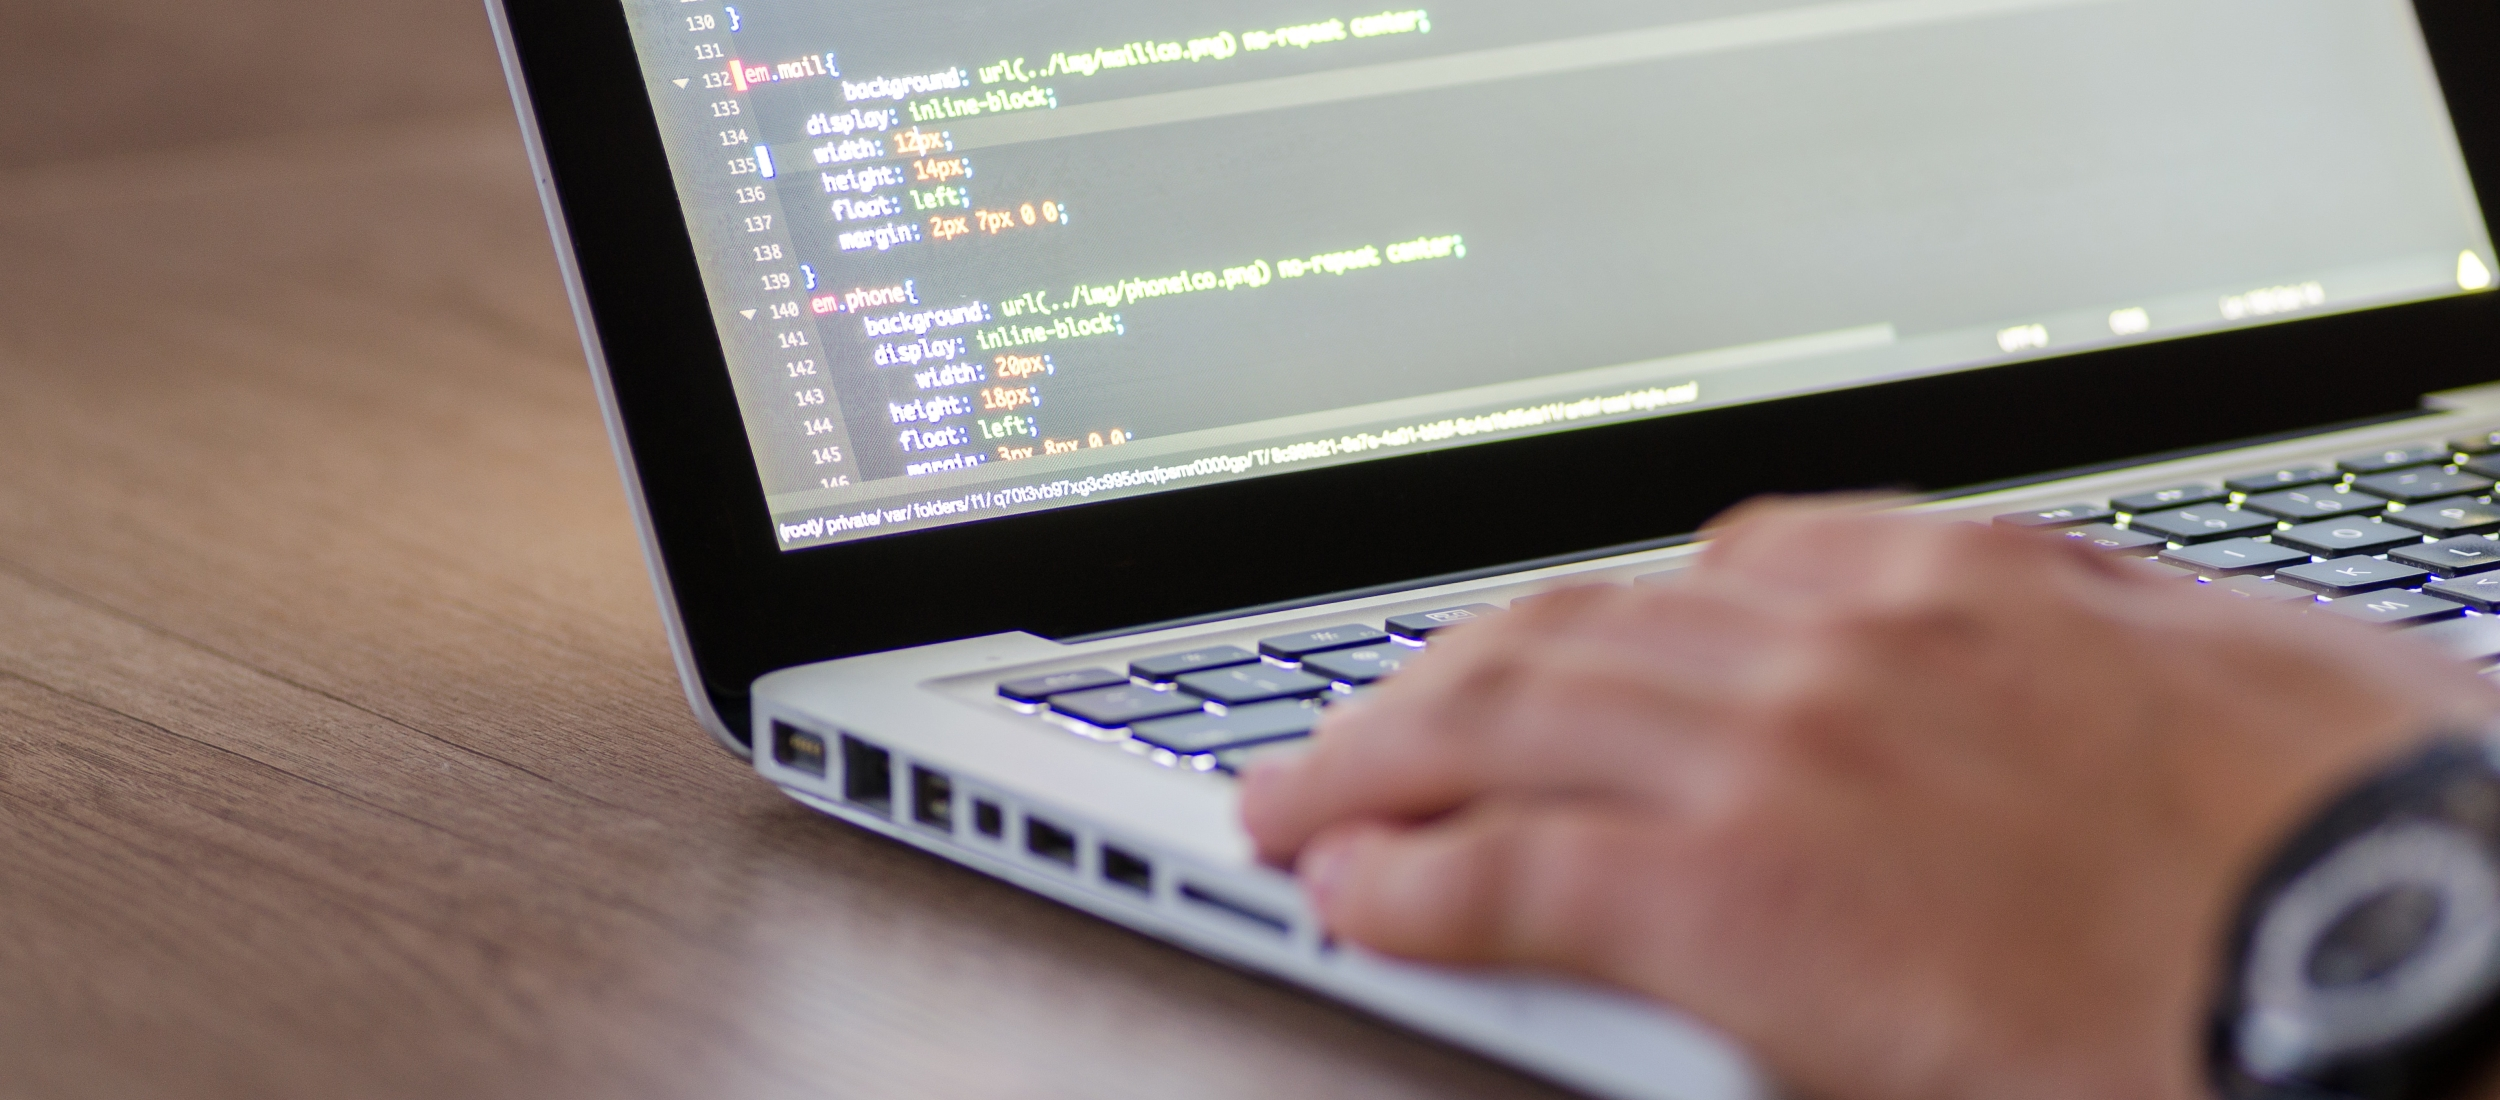 Qlik Best Practice - Scripting In Qlik Sense - Ometis